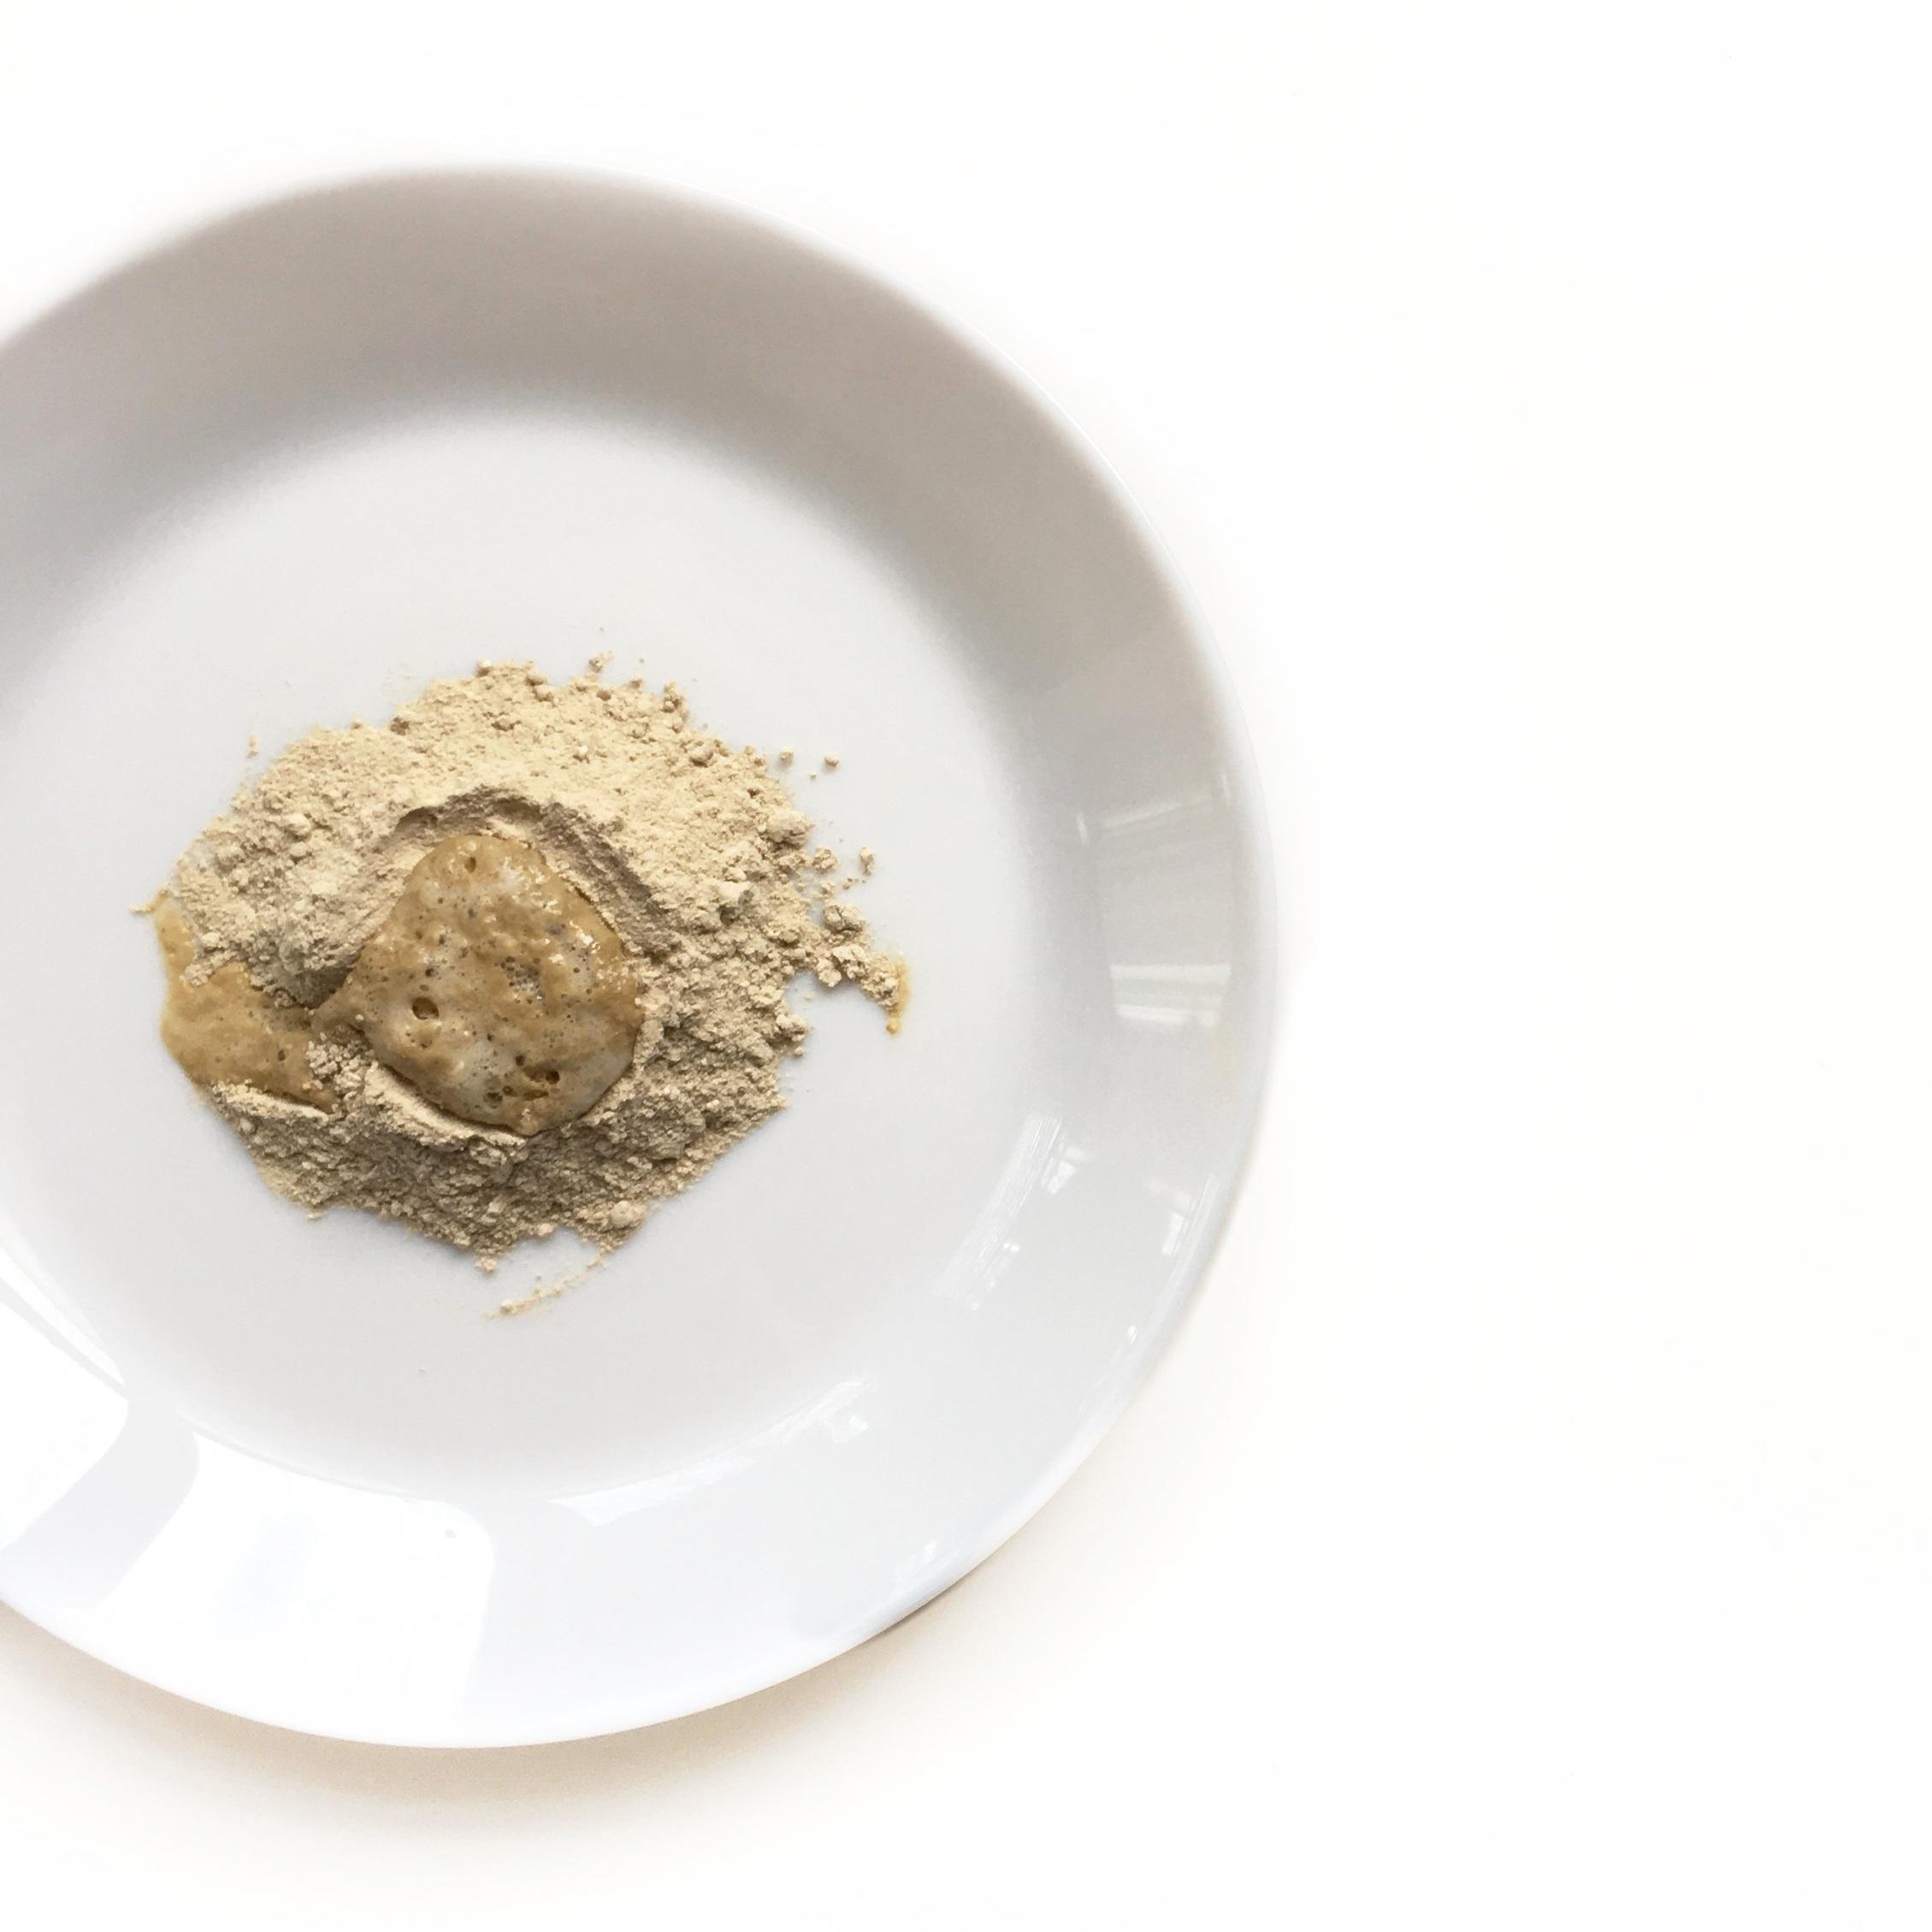 honey powder cleanser on plate